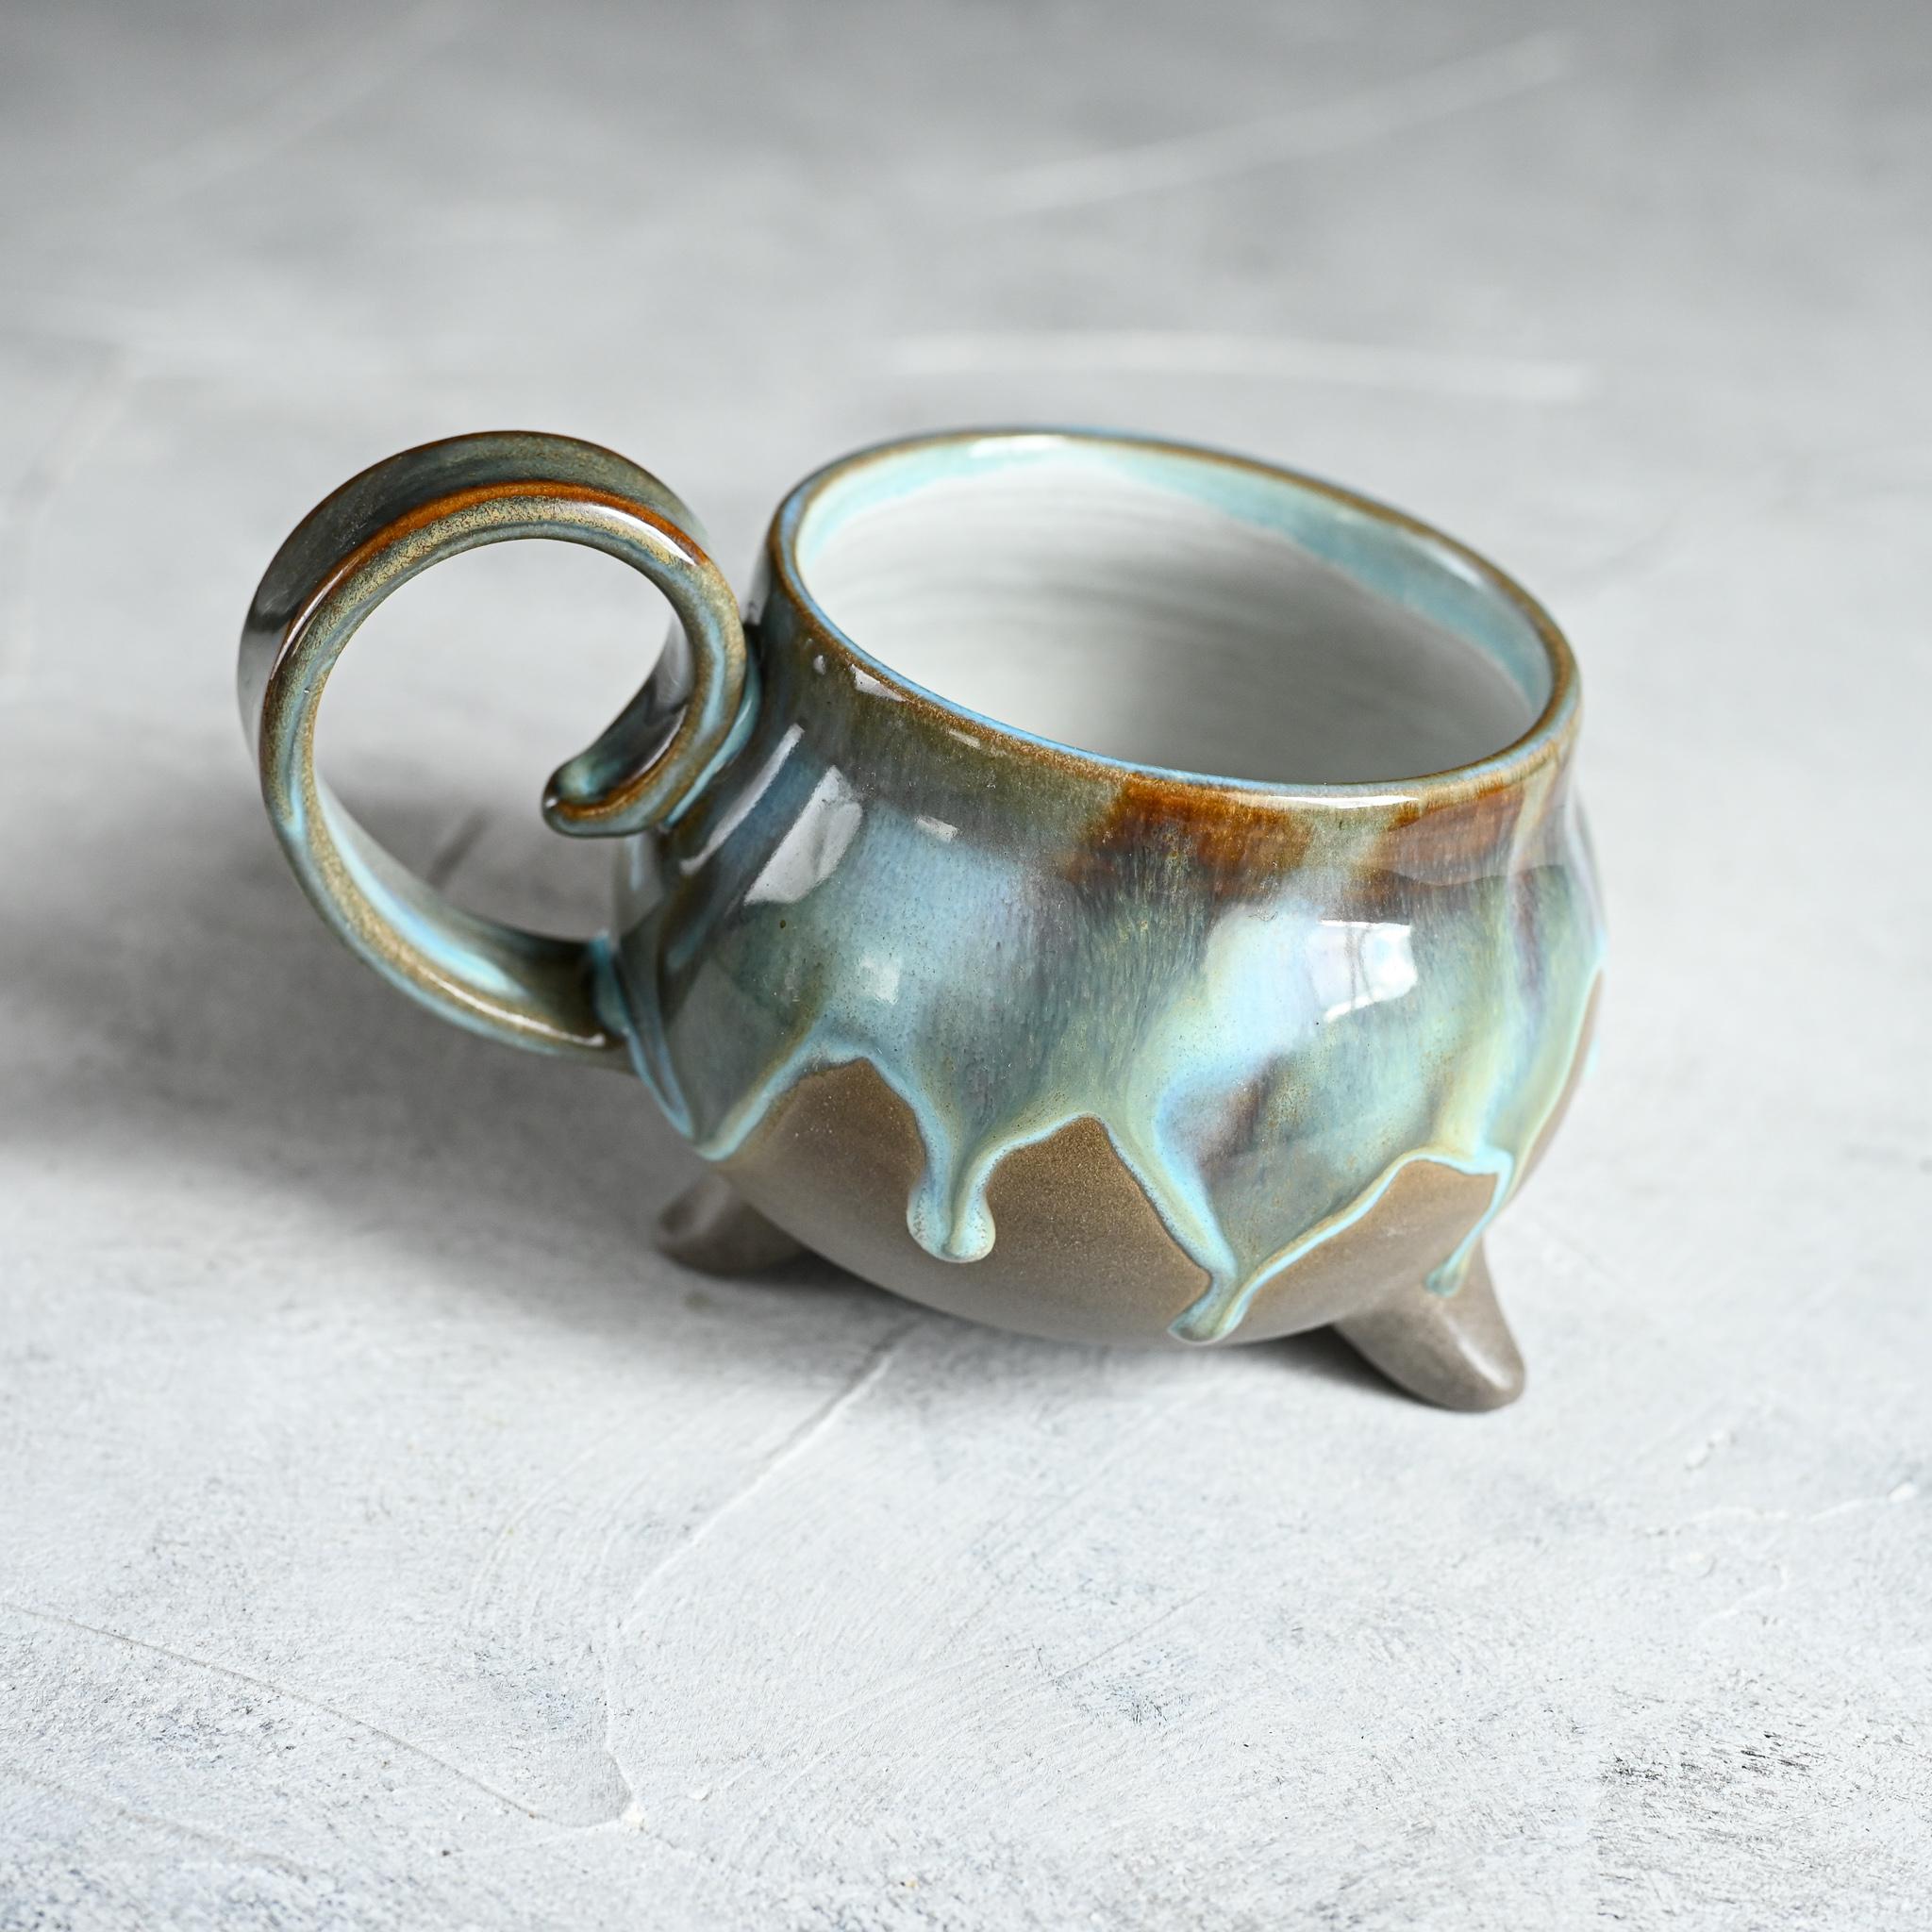 картинка Чашка на ножках Виктории Юрьевой 12 - DishWishes.Ru